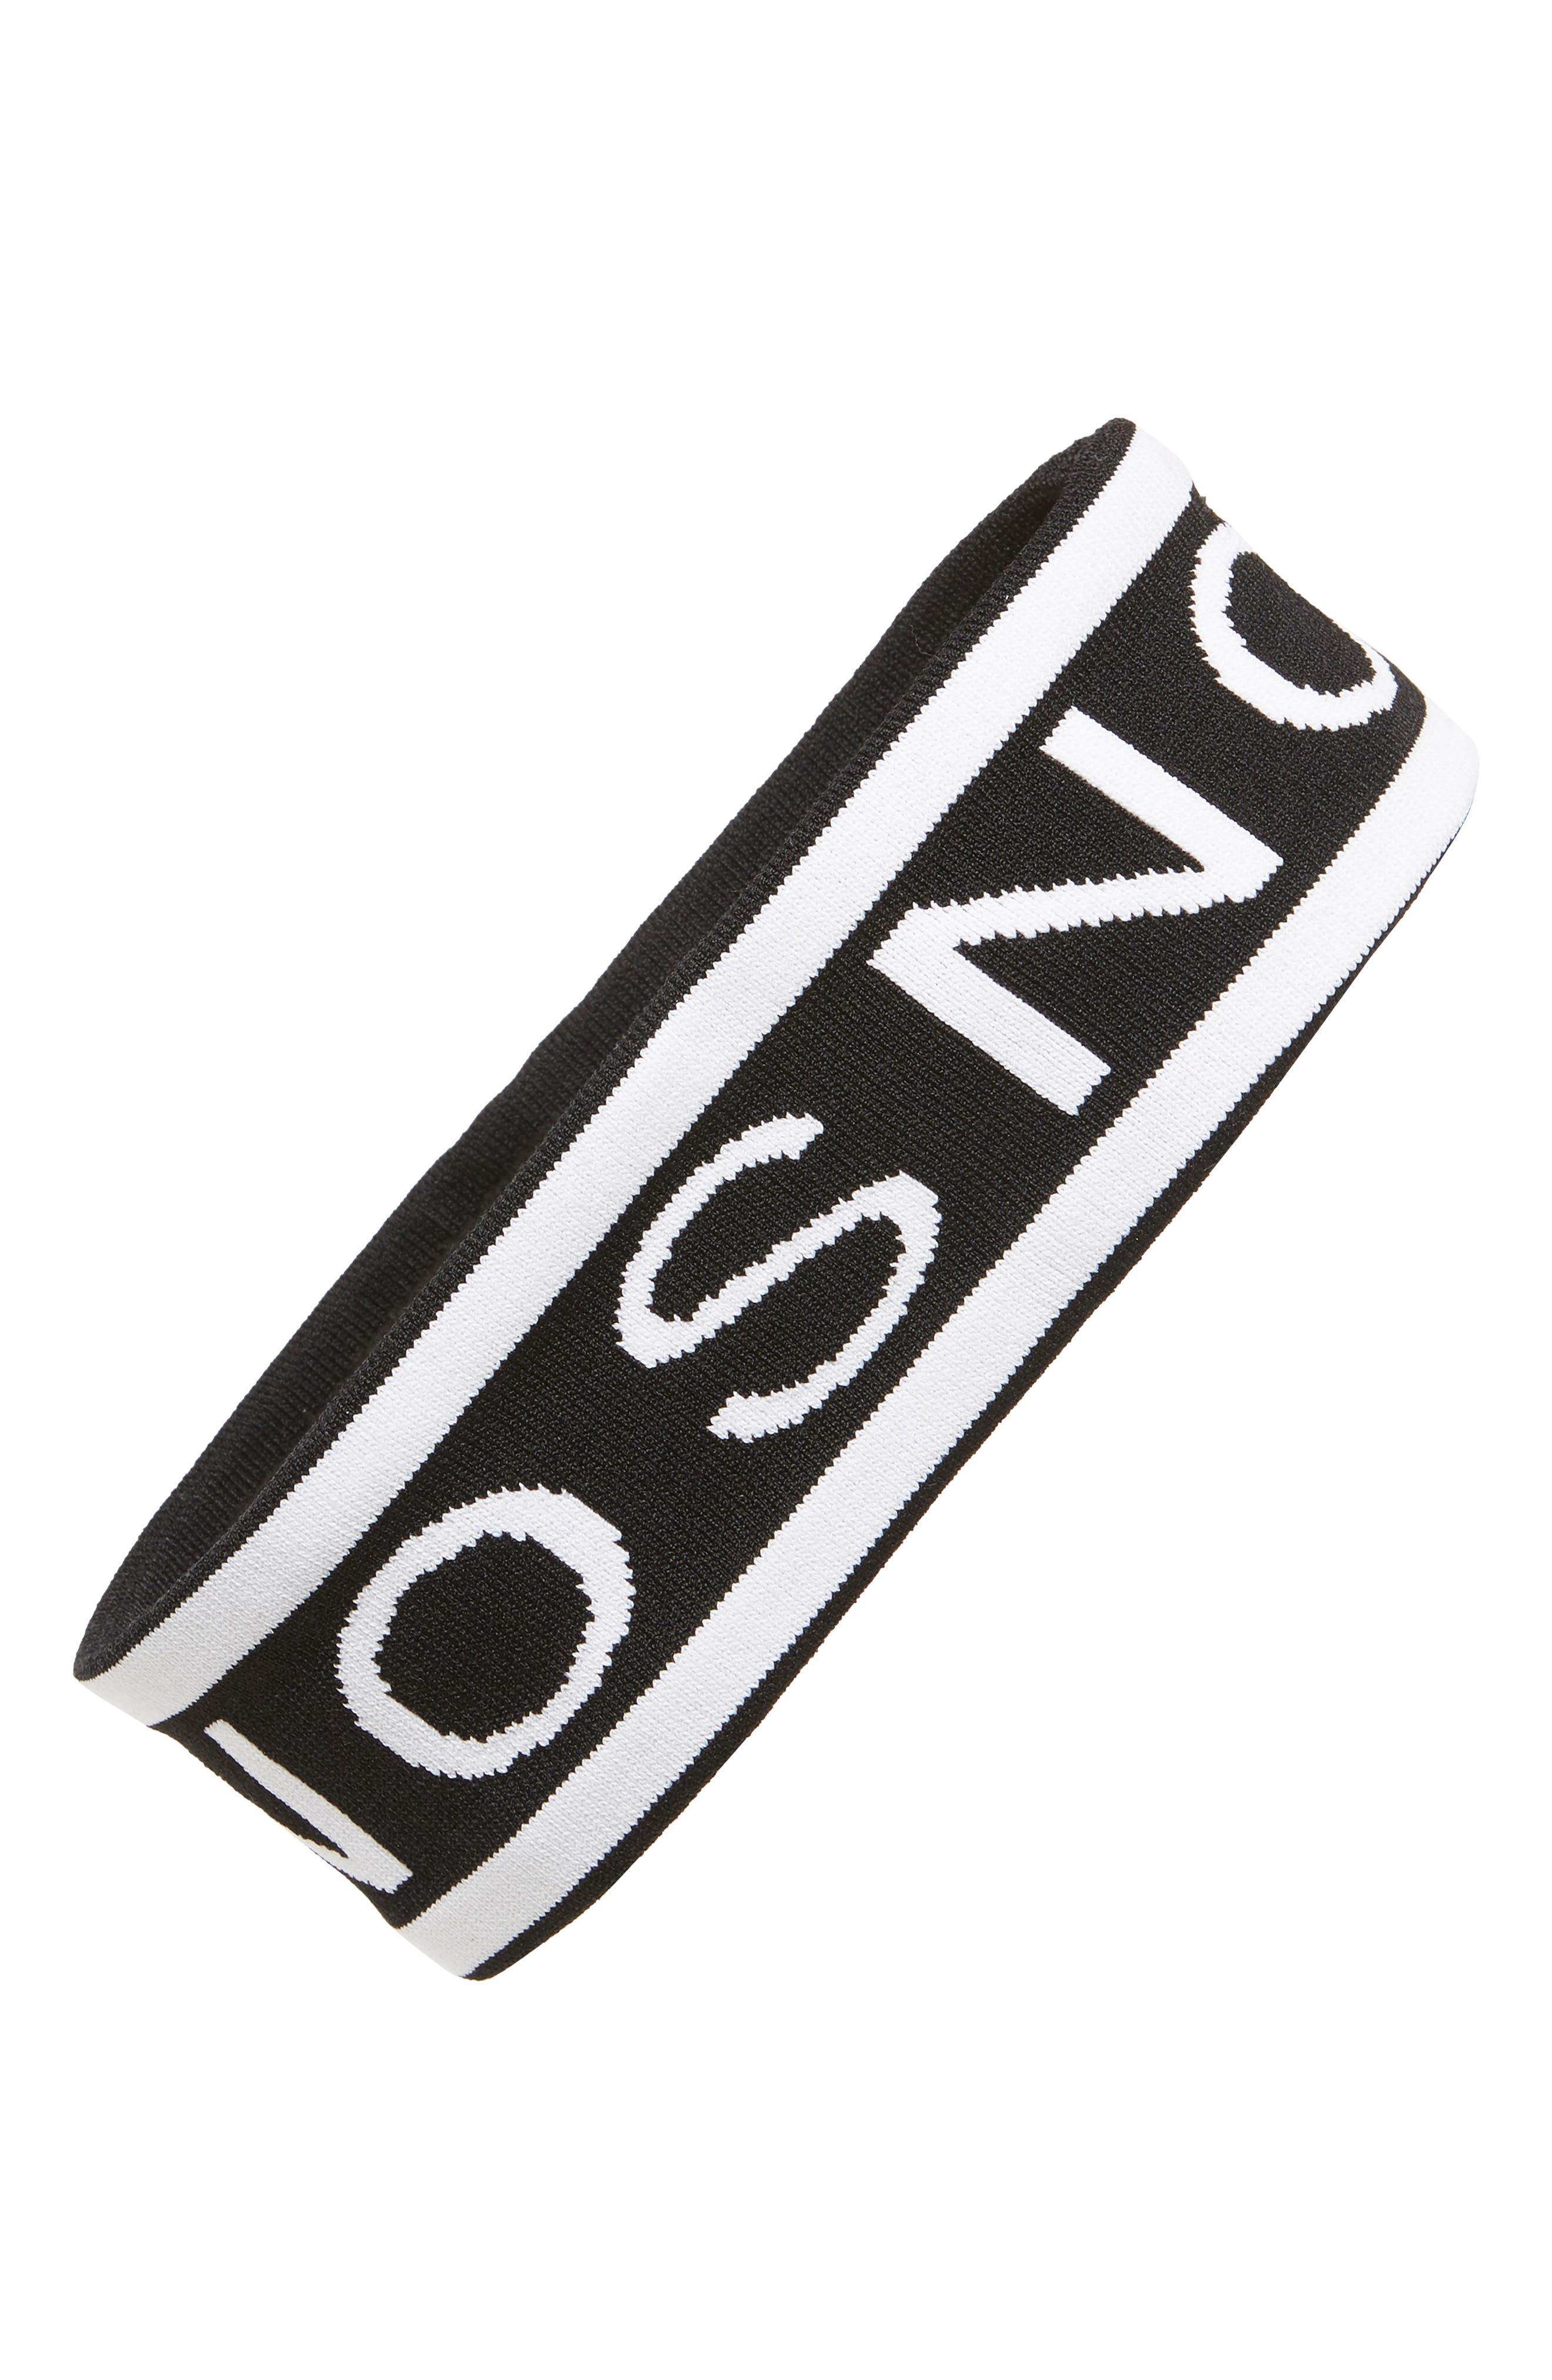 Sno Intarsia Knit Ear Warmer Headband,                             Main thumbnail 1, color,                             001